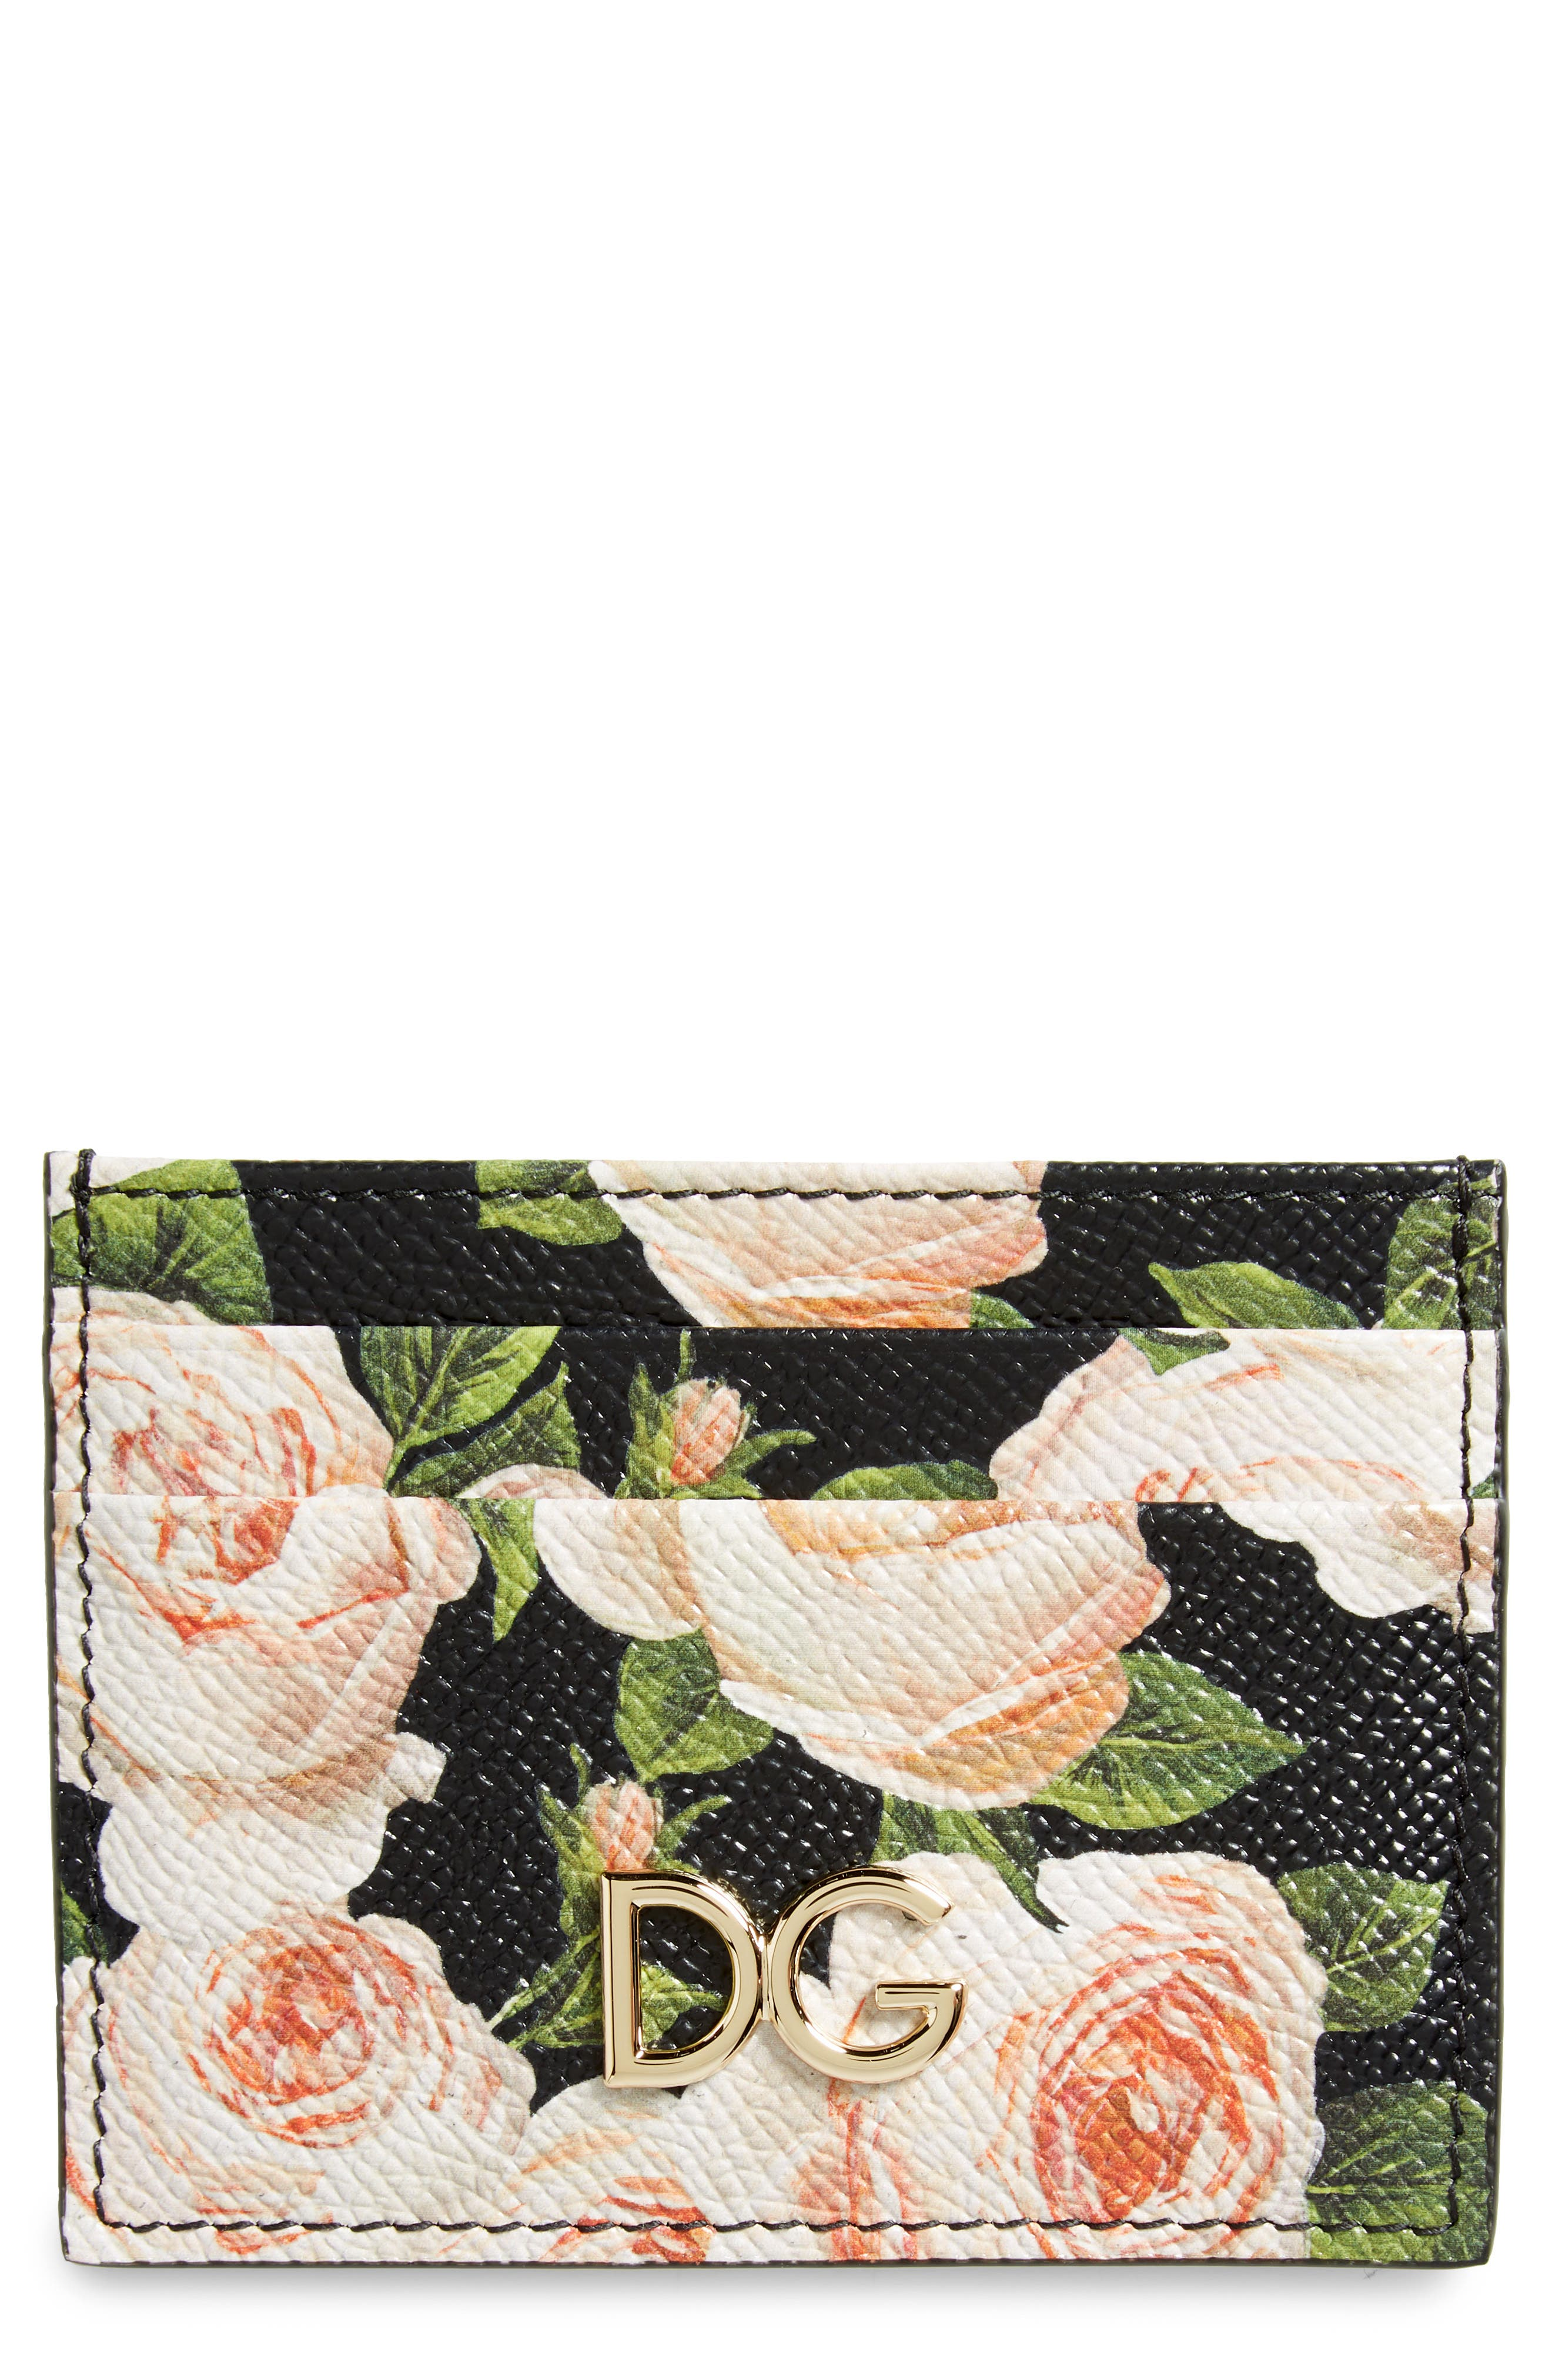 DOLCE&GABBANA Rose Print Leather Card Case, Main, color, 001